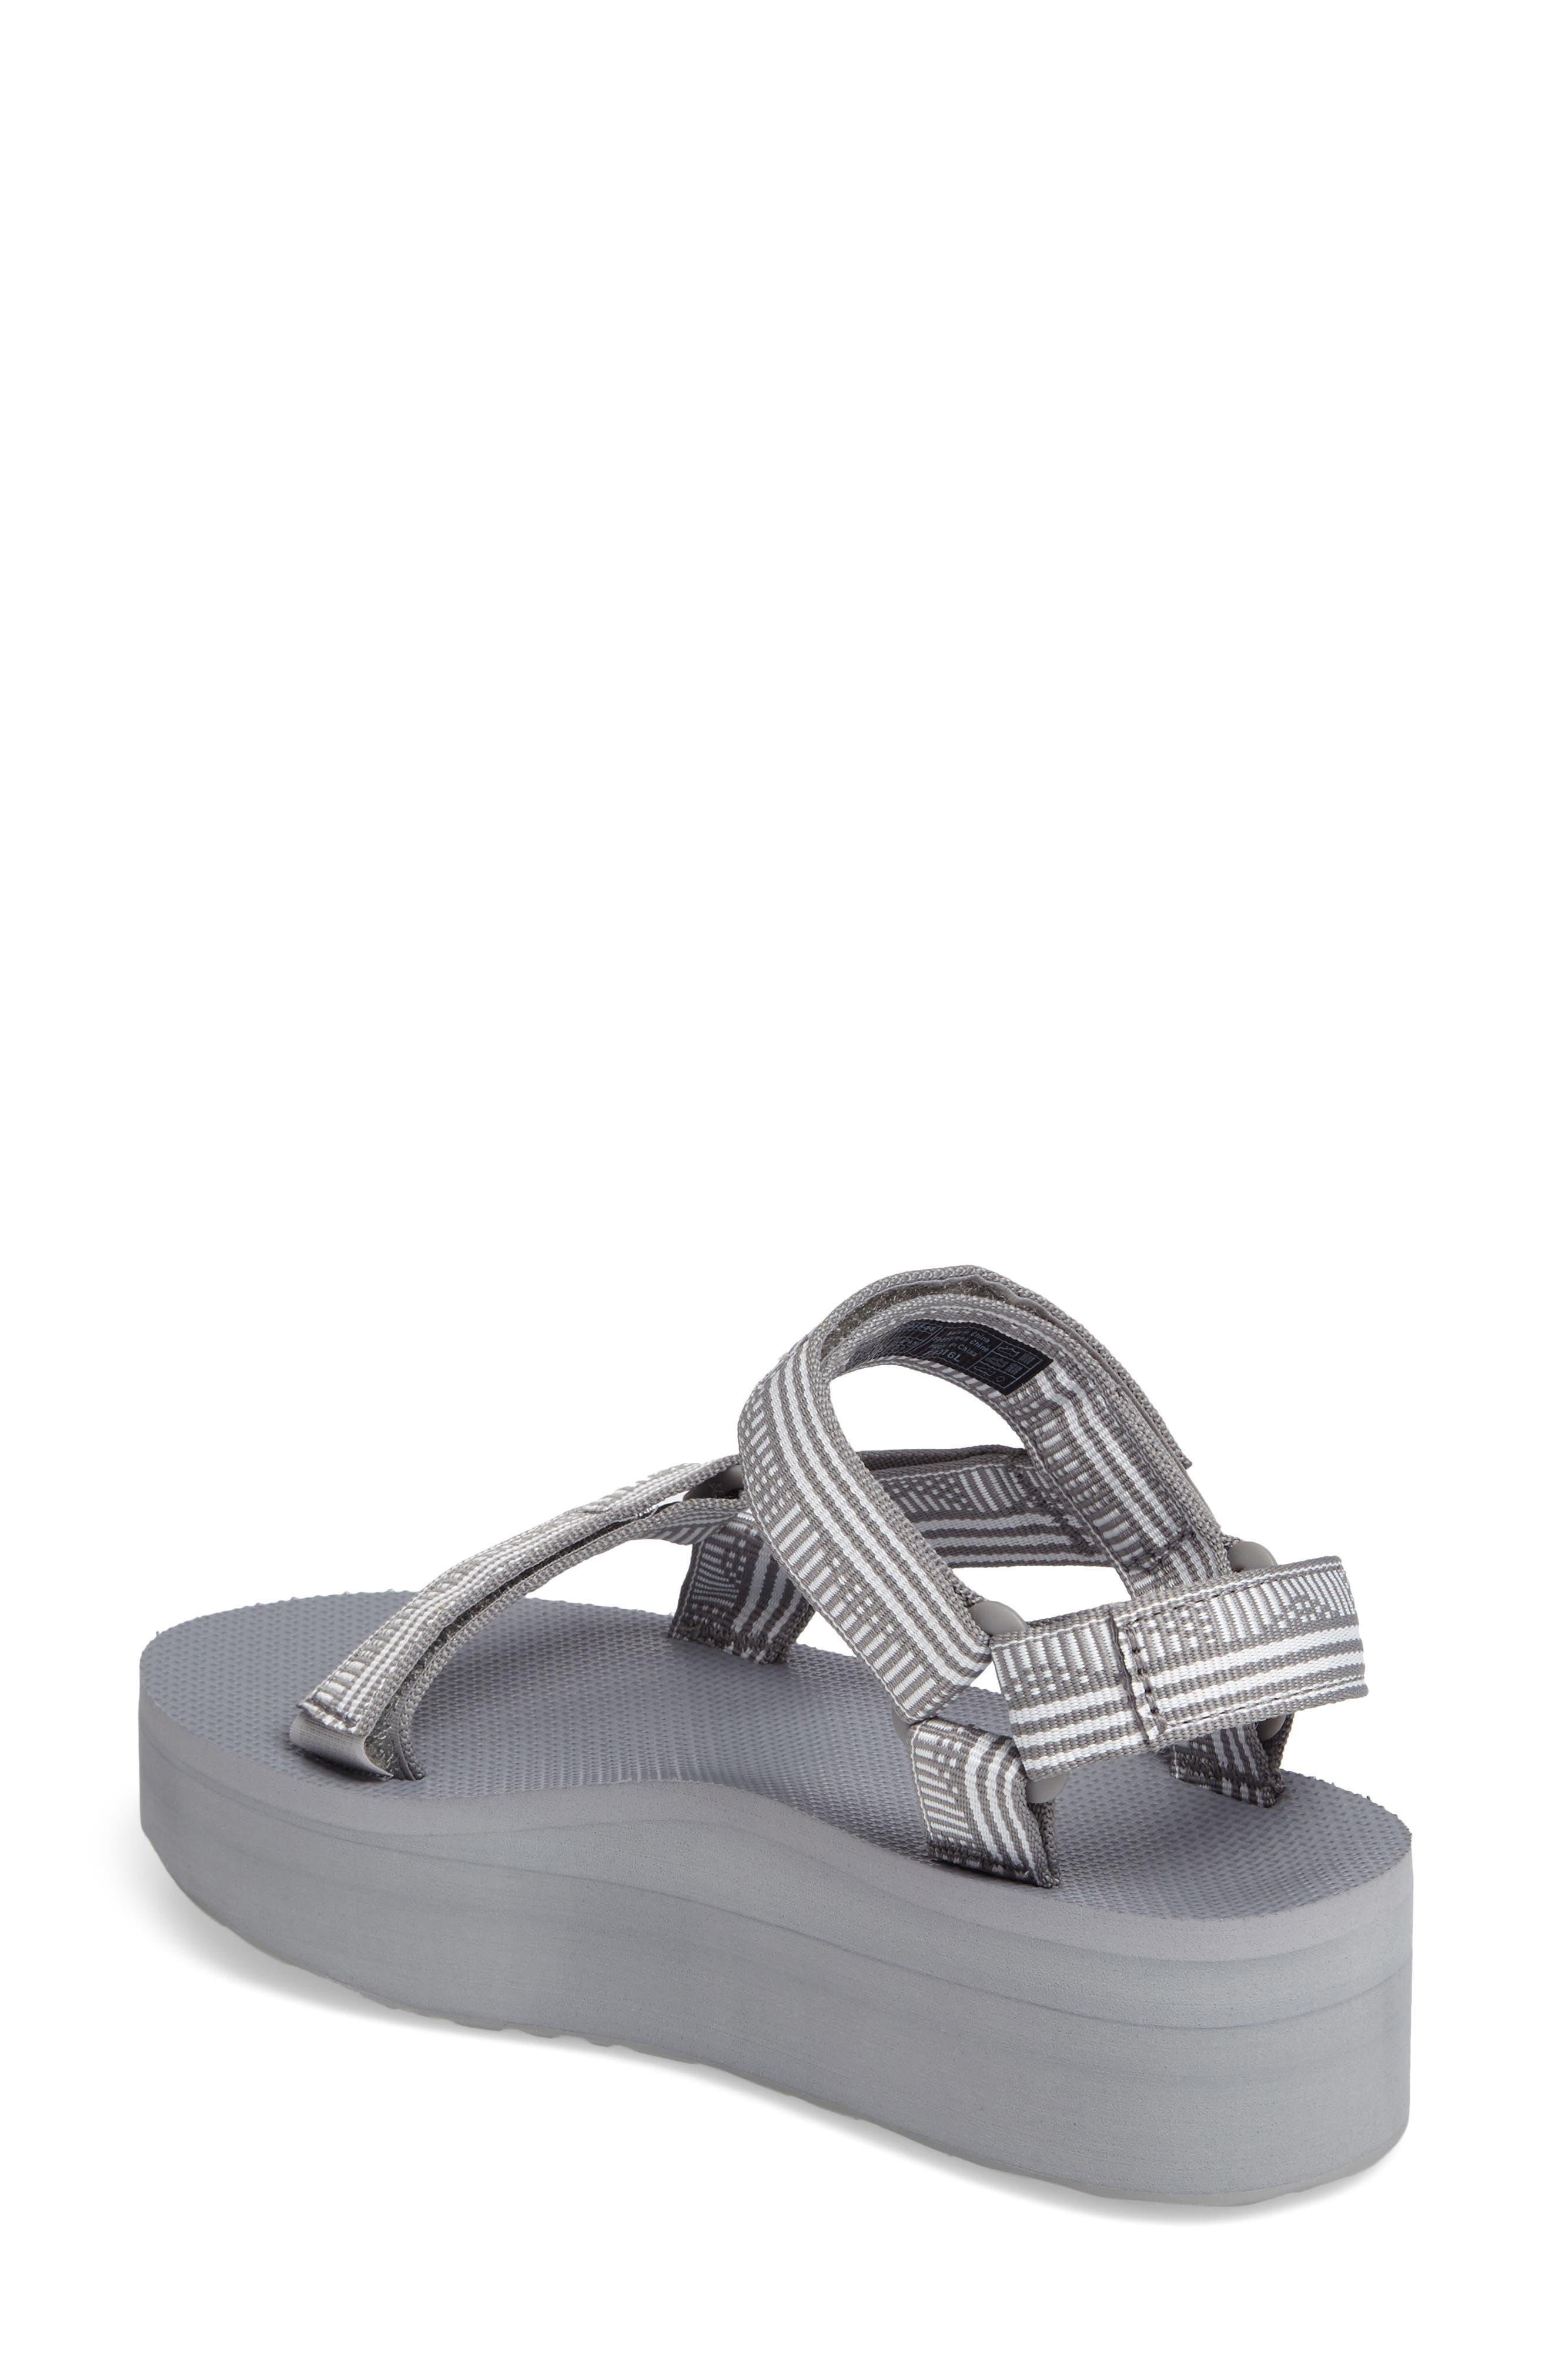 Alternate Image 2  - Teva 'Universal' Flatform Sandal (Women)